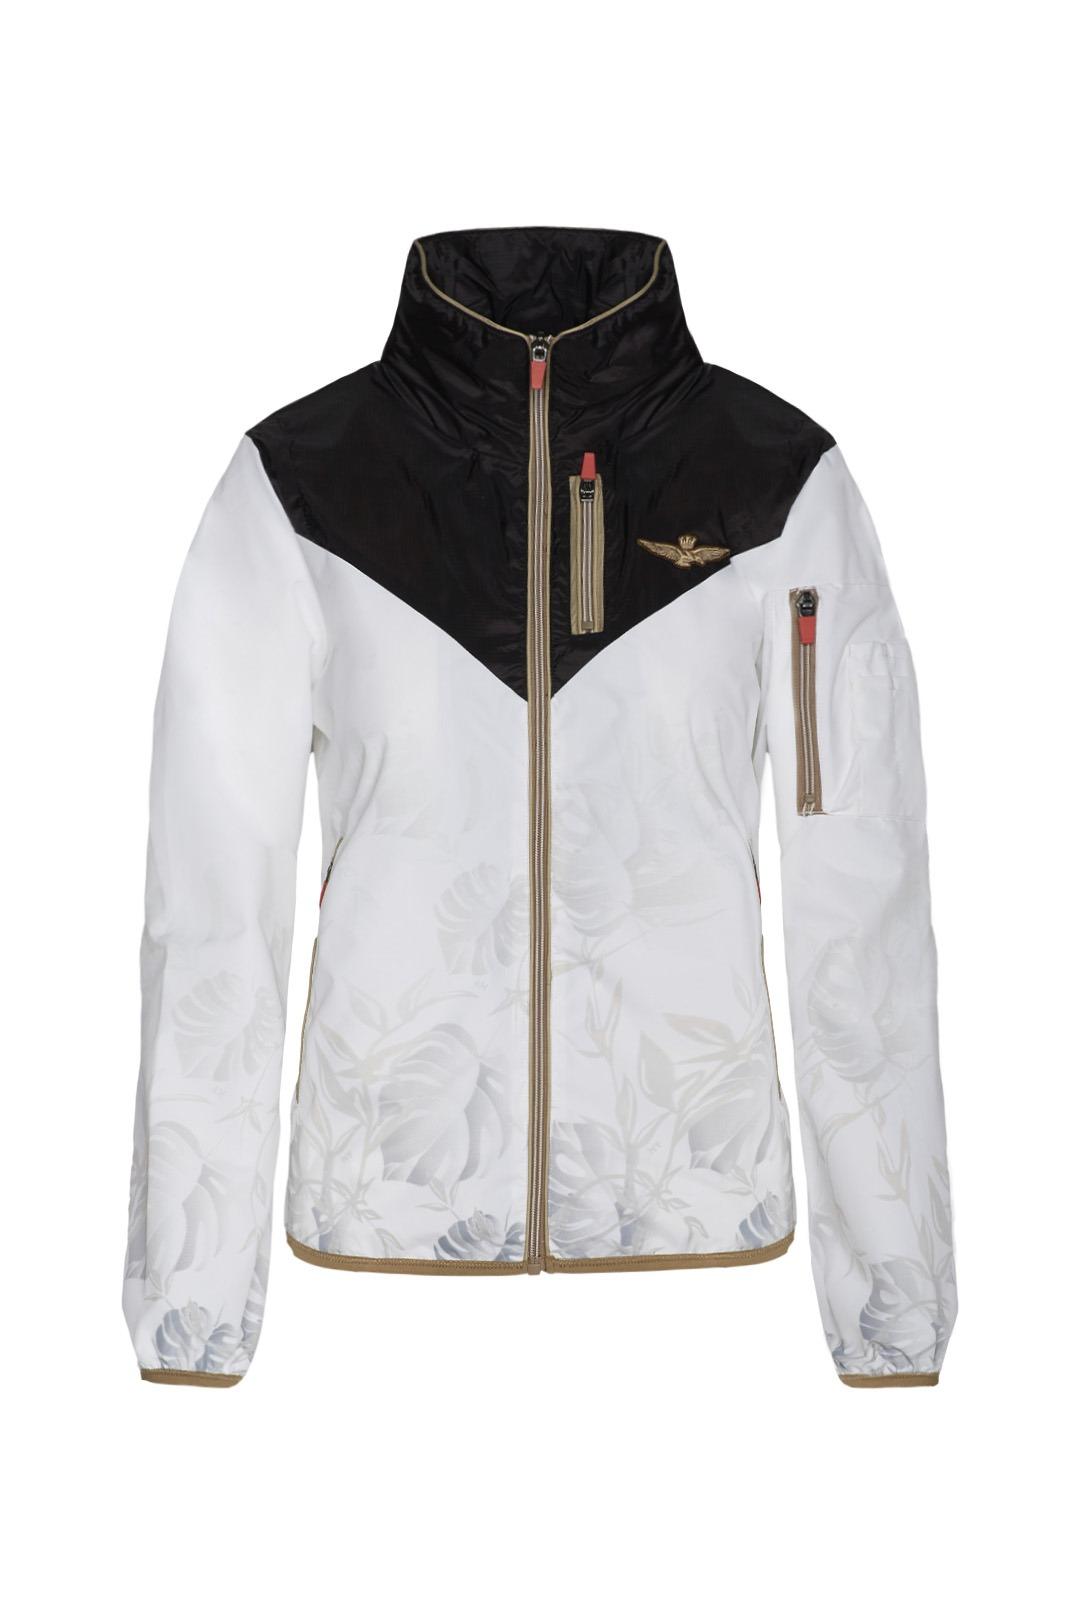 Tropical pattern Jacket                        1